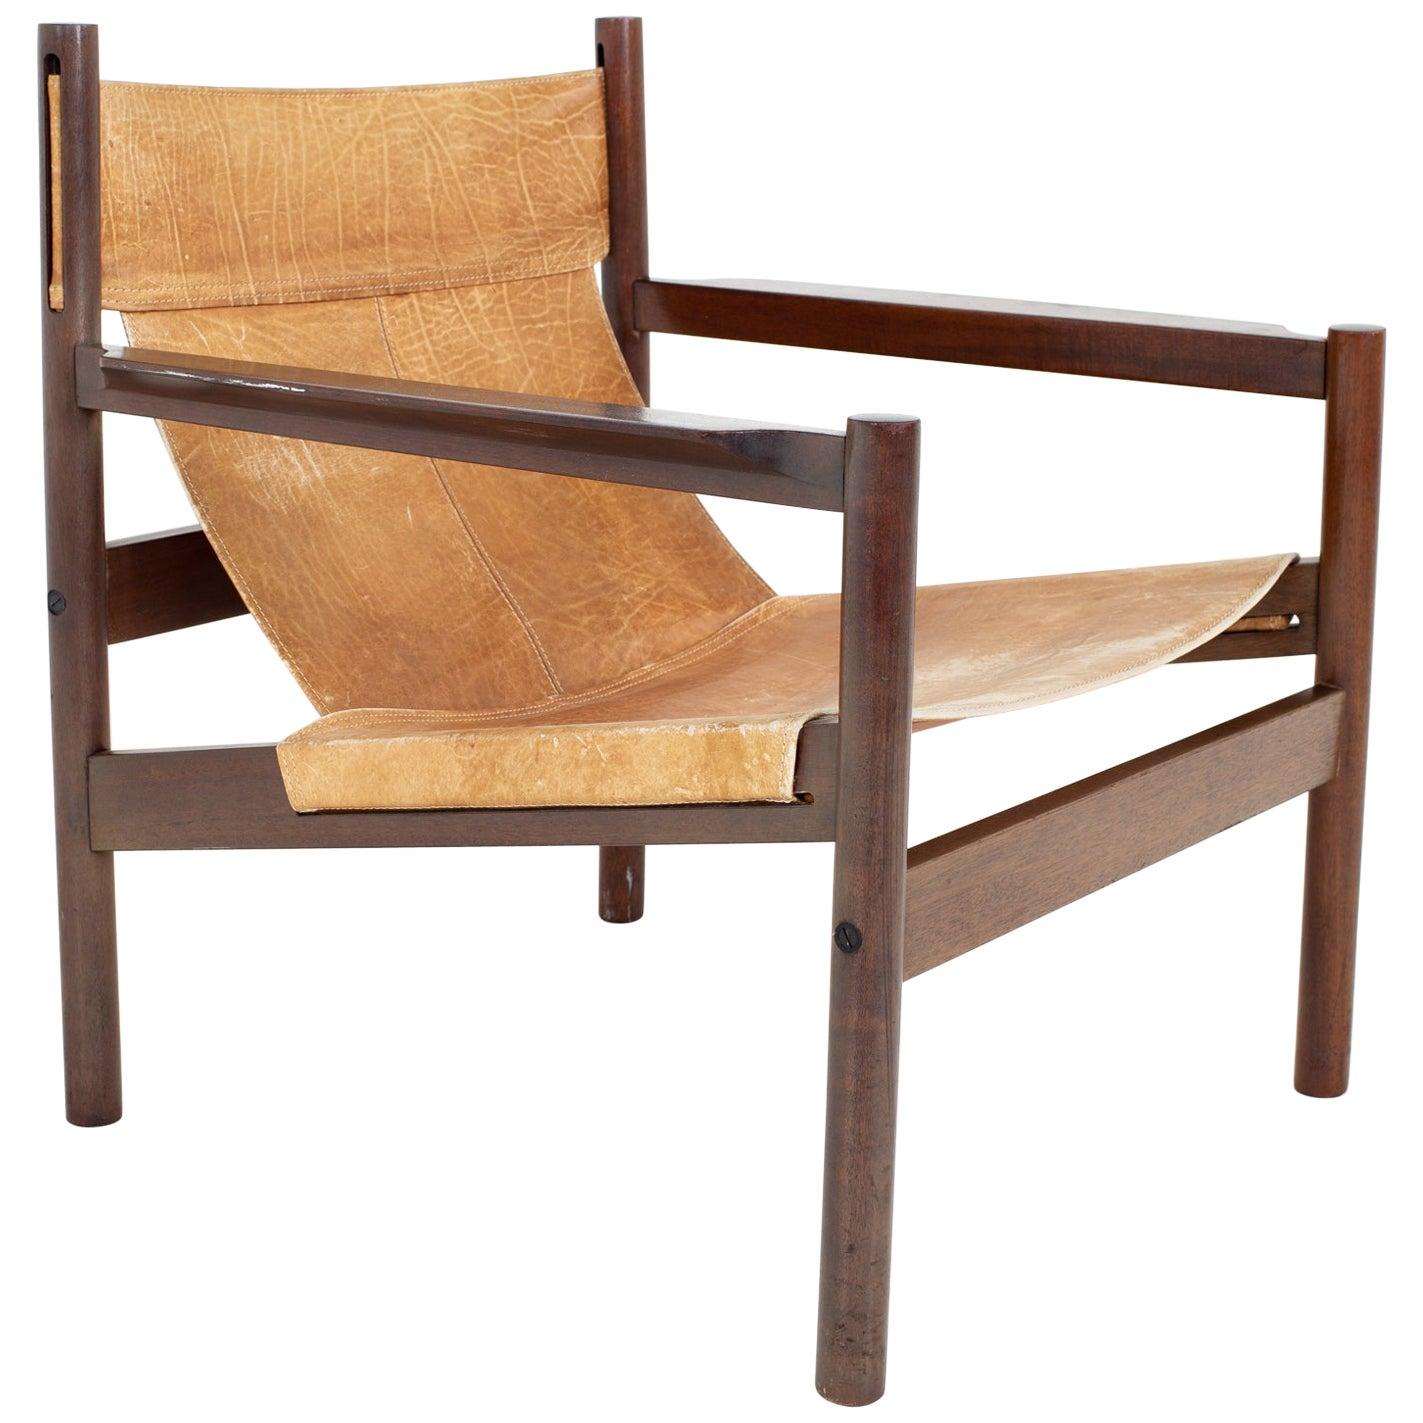 Erik Worts Arne Norell Safari Style Mid Century Leather Sling Lounge Chair